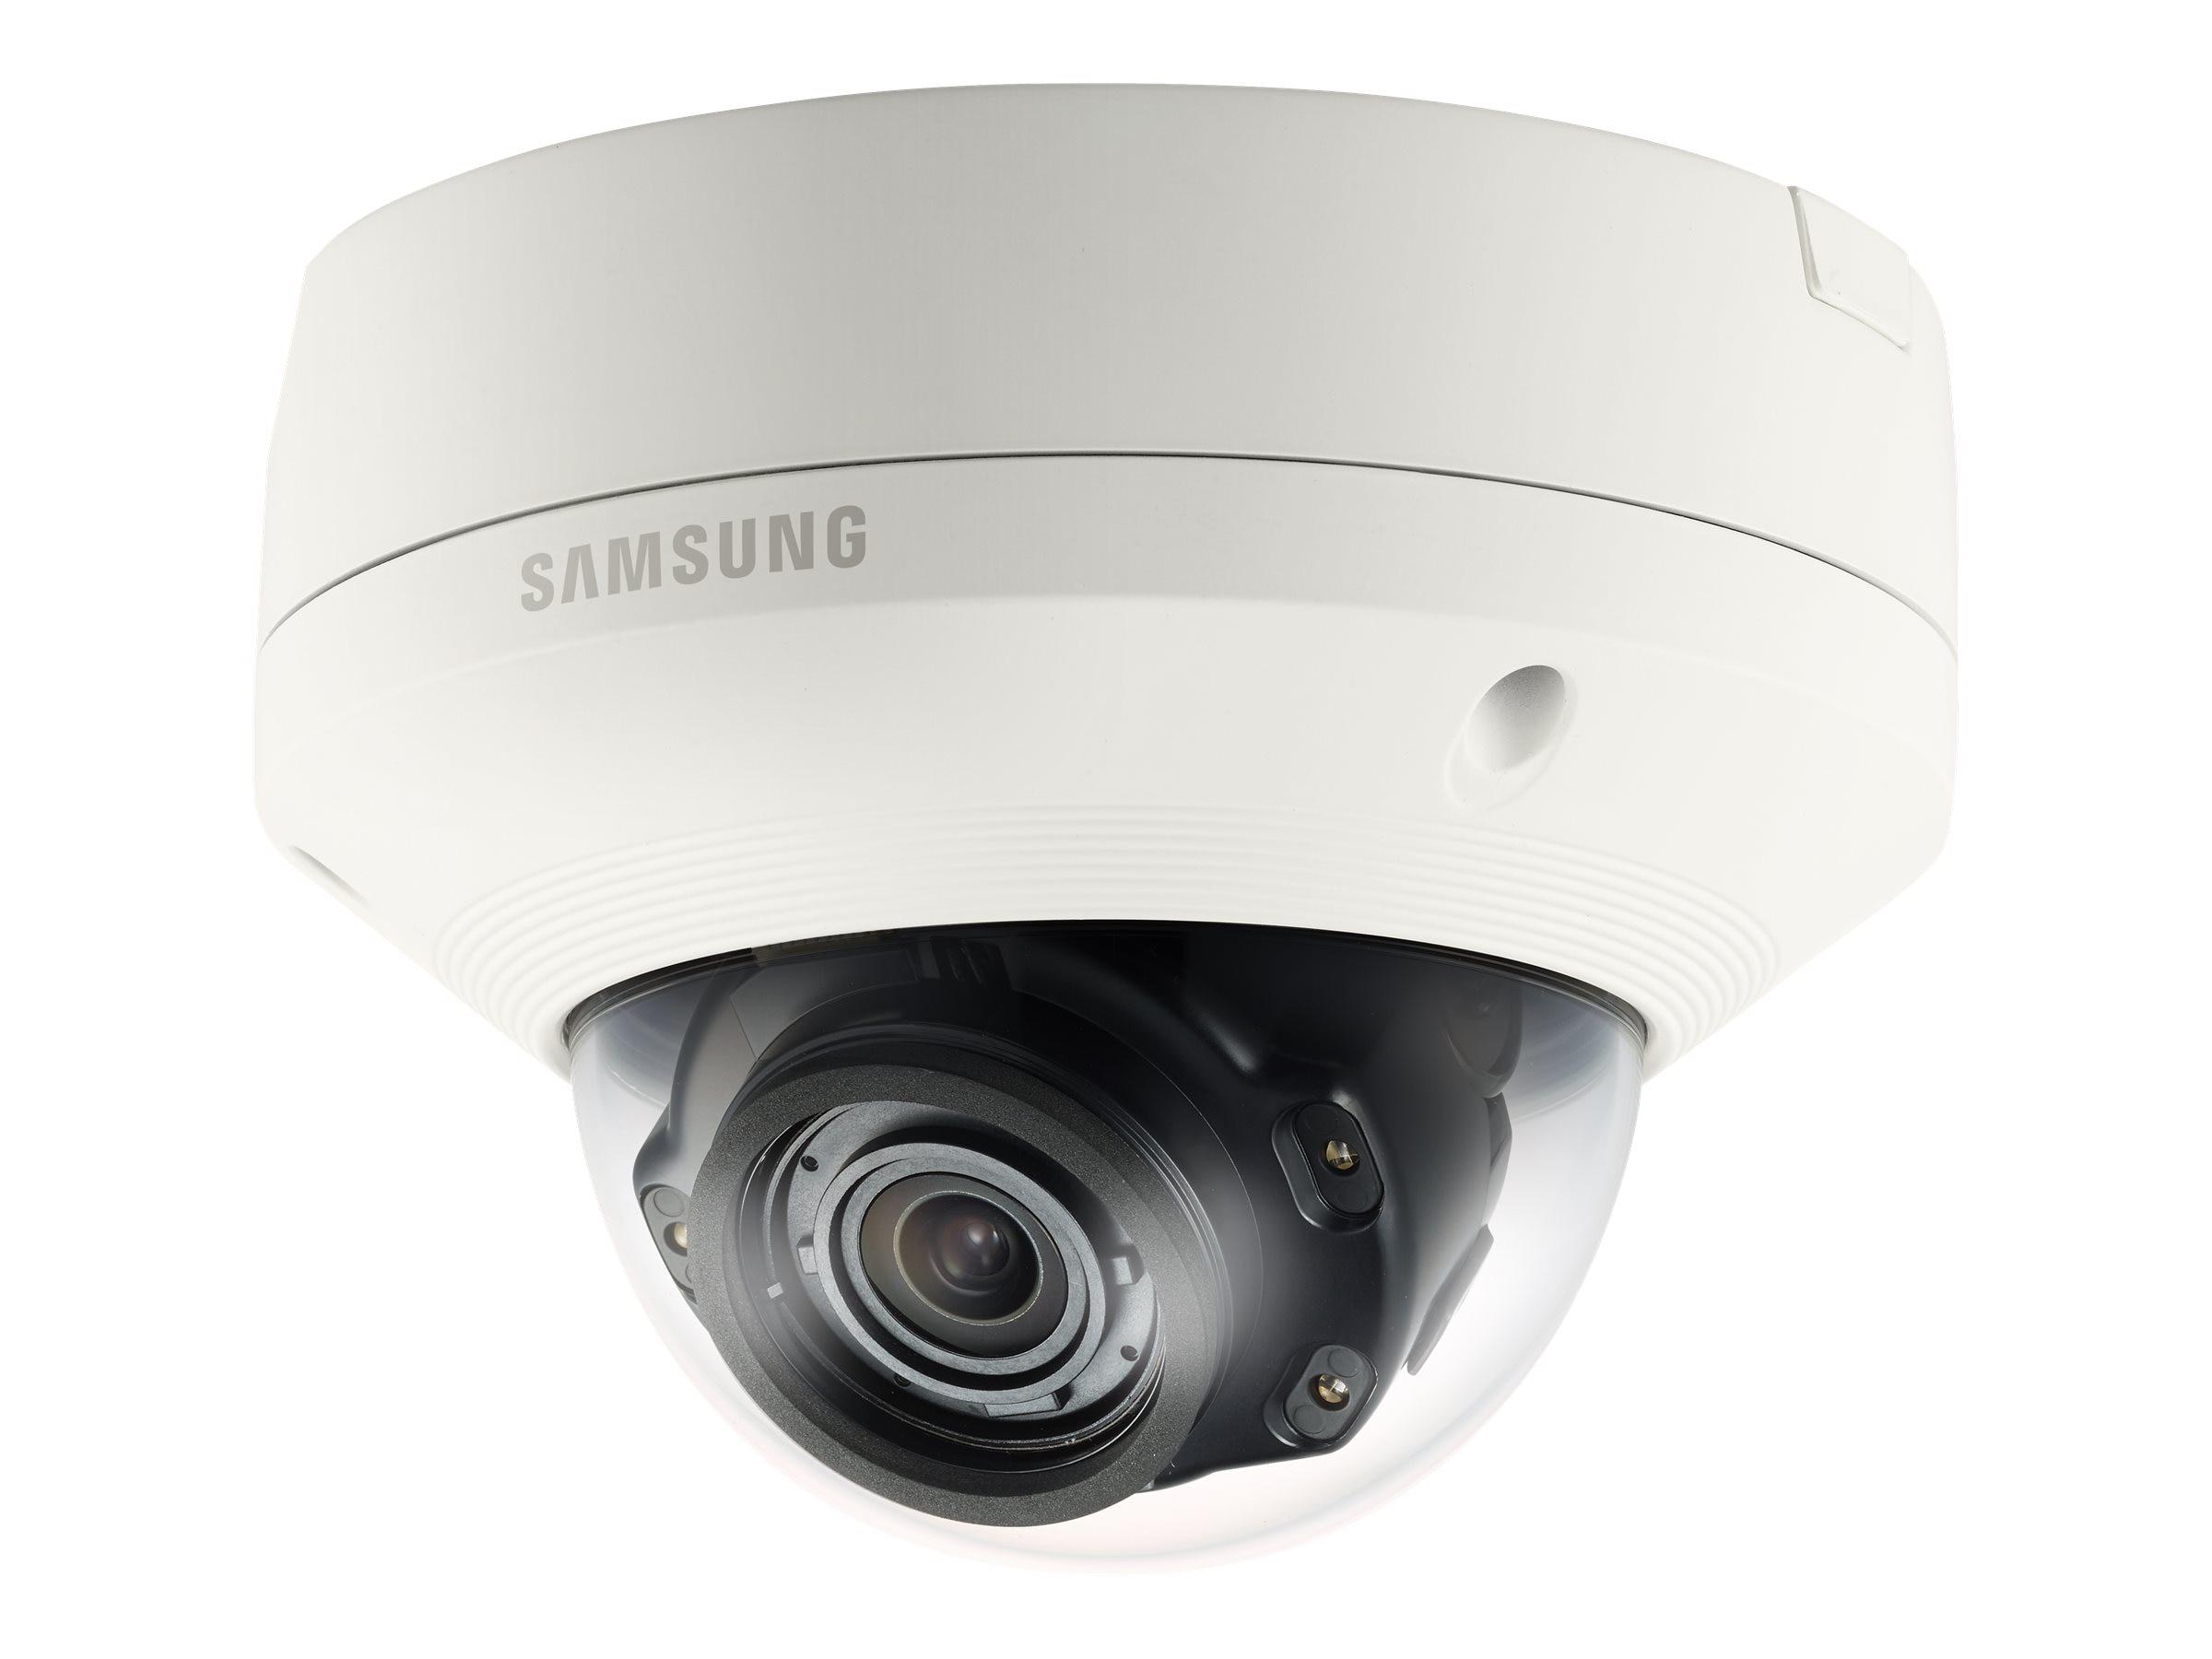 Samsung 5MP Vandal-Resistant Network IR Dome Camera, White